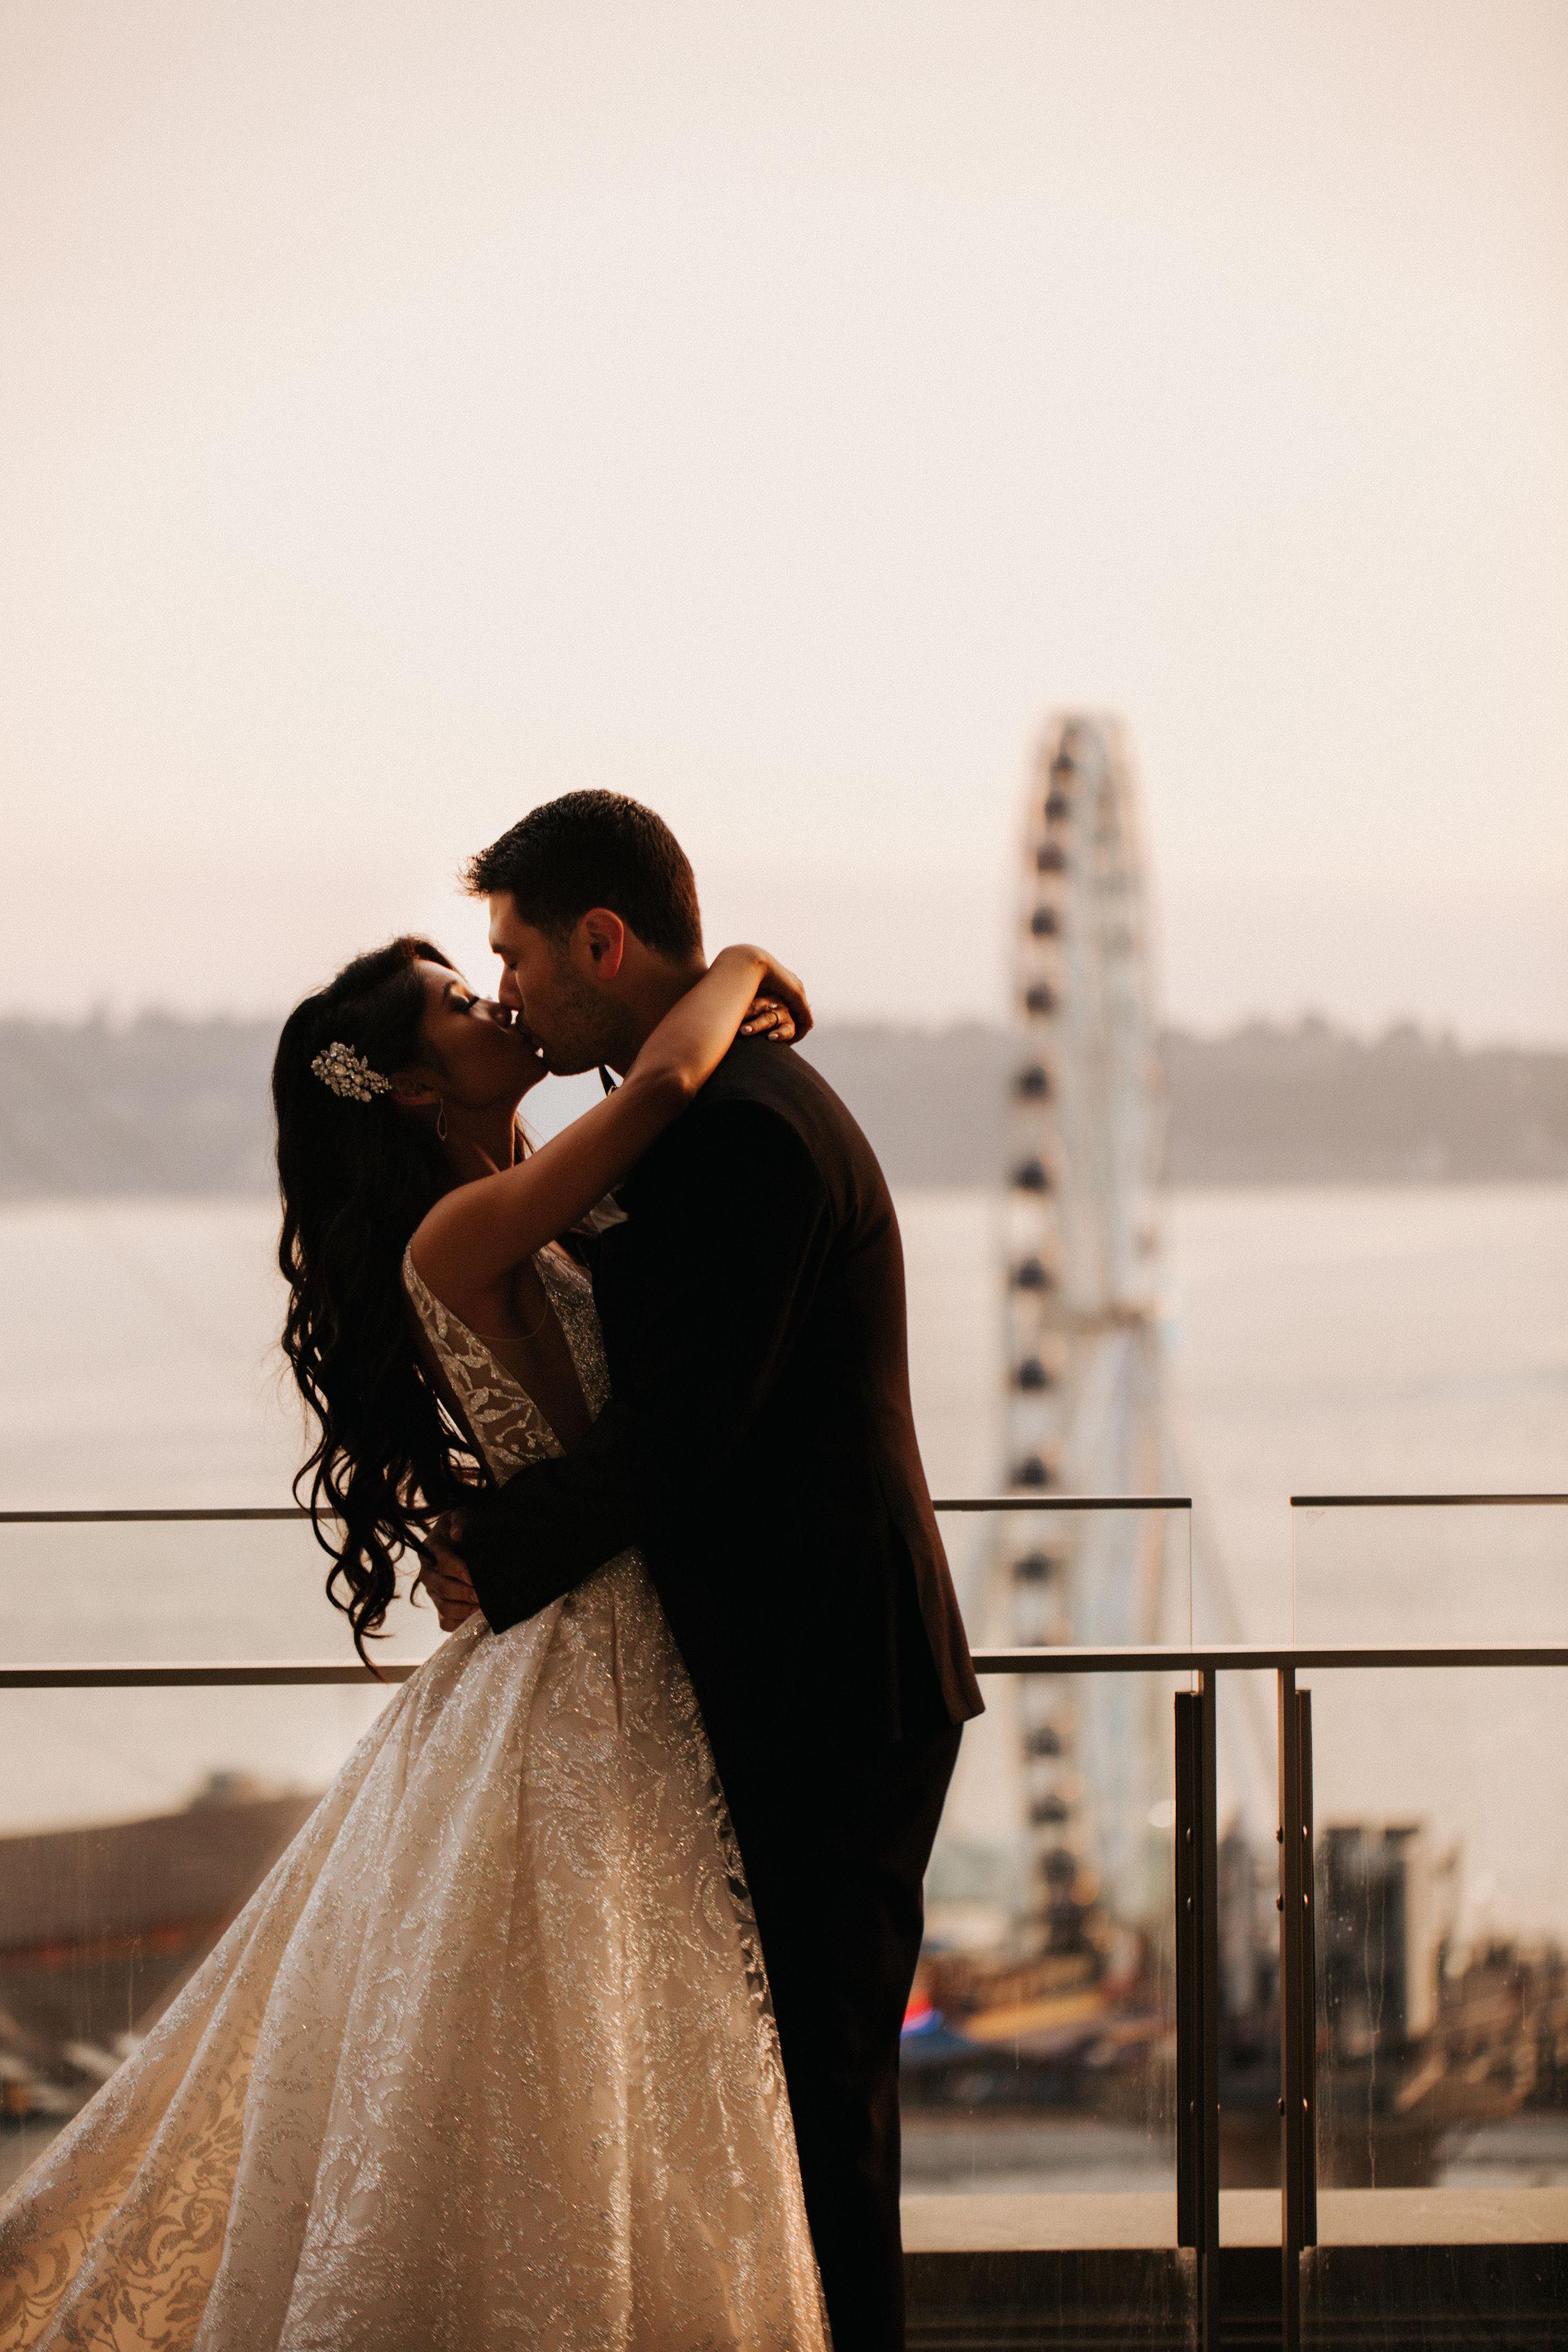 Bridalbliss.com | Seattle Wedding | Washington Event Coordination and Design | Wiley Putnum